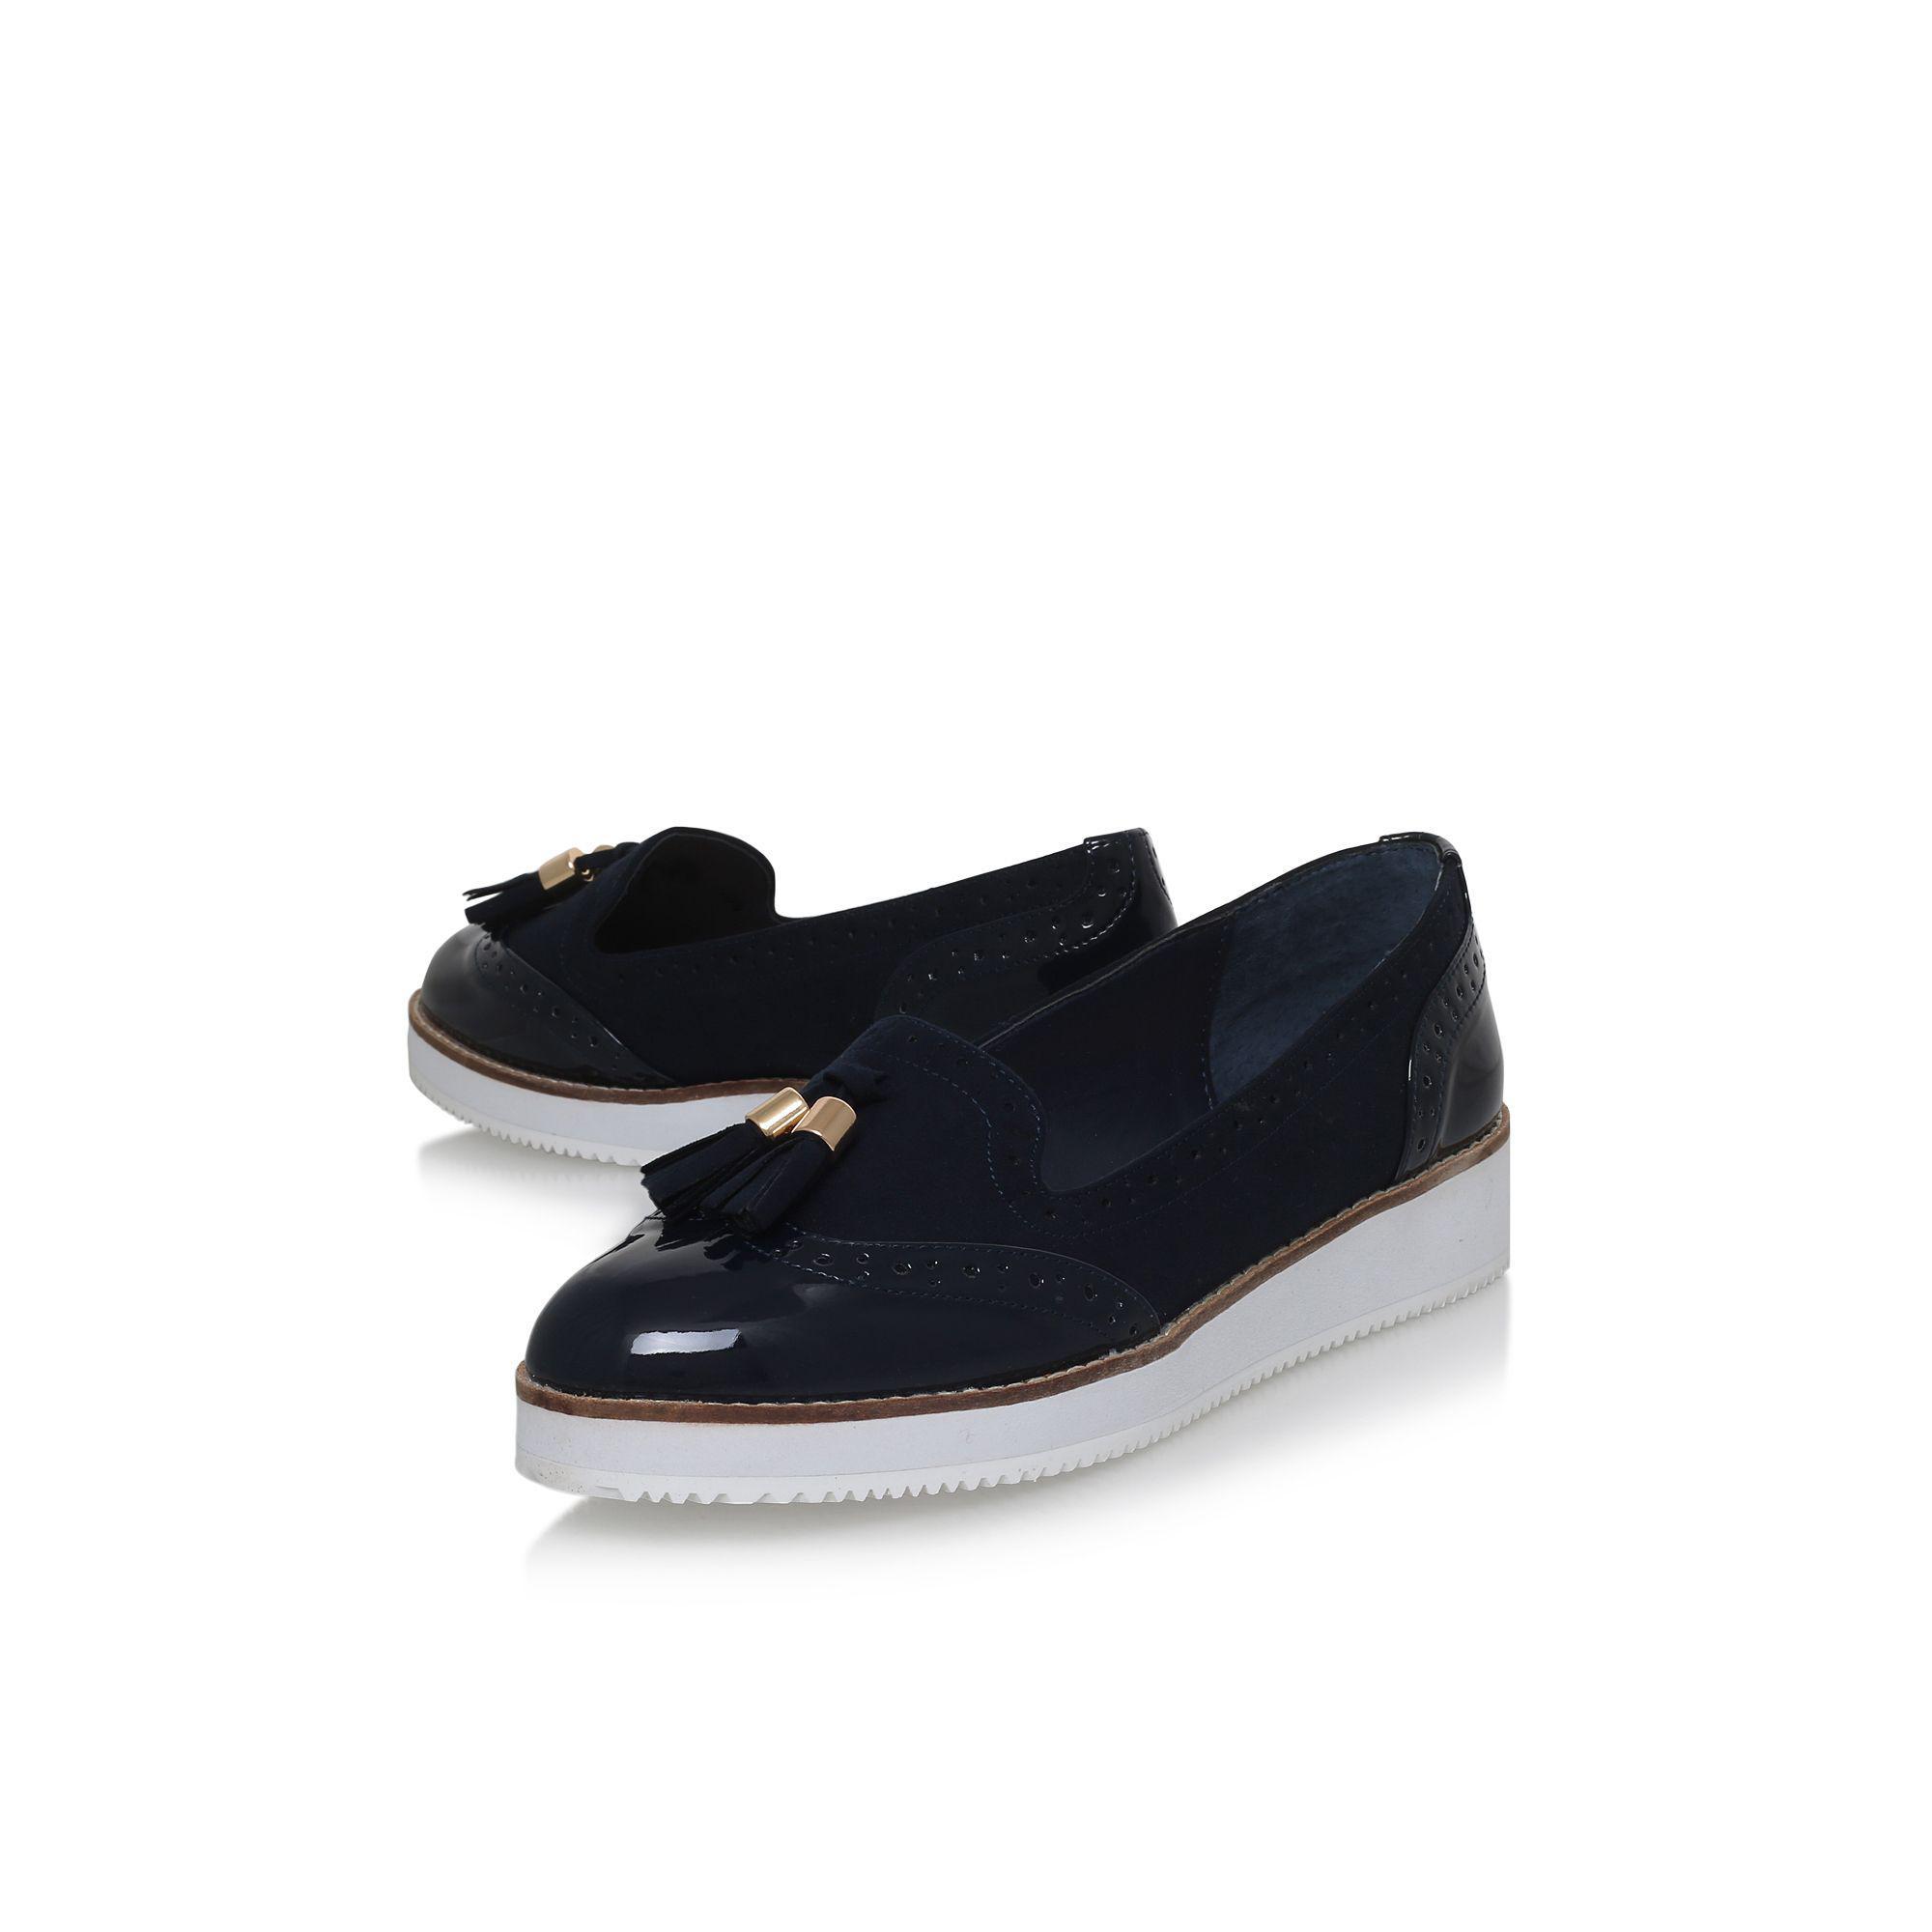 Blue 'Mitch' flat slip on loafers enjoy cheap online sehW5qAp